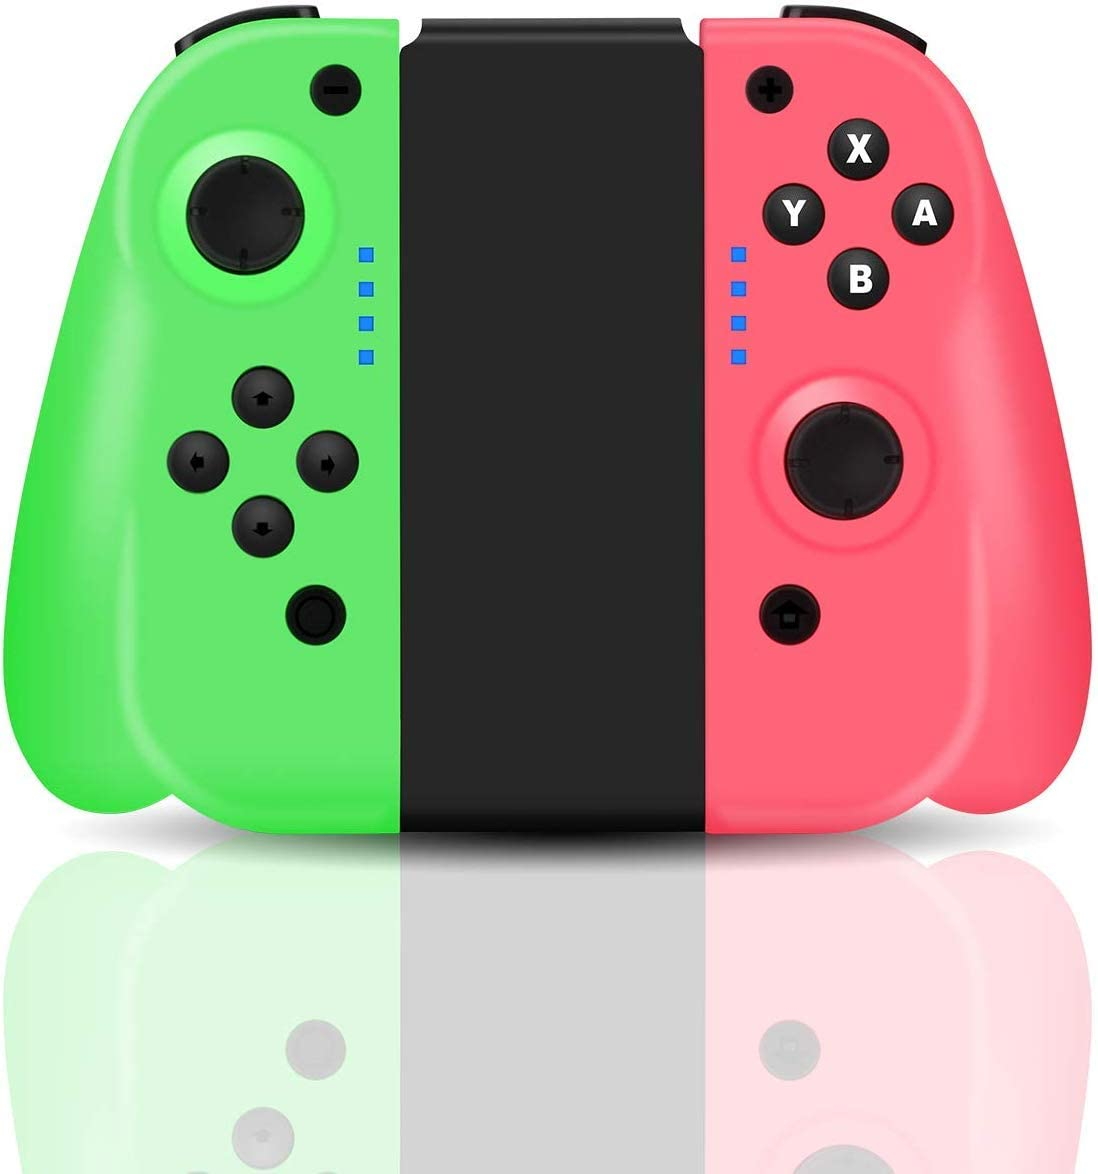 Maegoo Mando para Nintendo Switch, JoyCon Switch Controlador Gamepad Joysticks para Nintendo Switch, Bluetooth Inalámbrico Switch Mando Joycon con Doble Vibración y Giroscopio de 6 Ejes